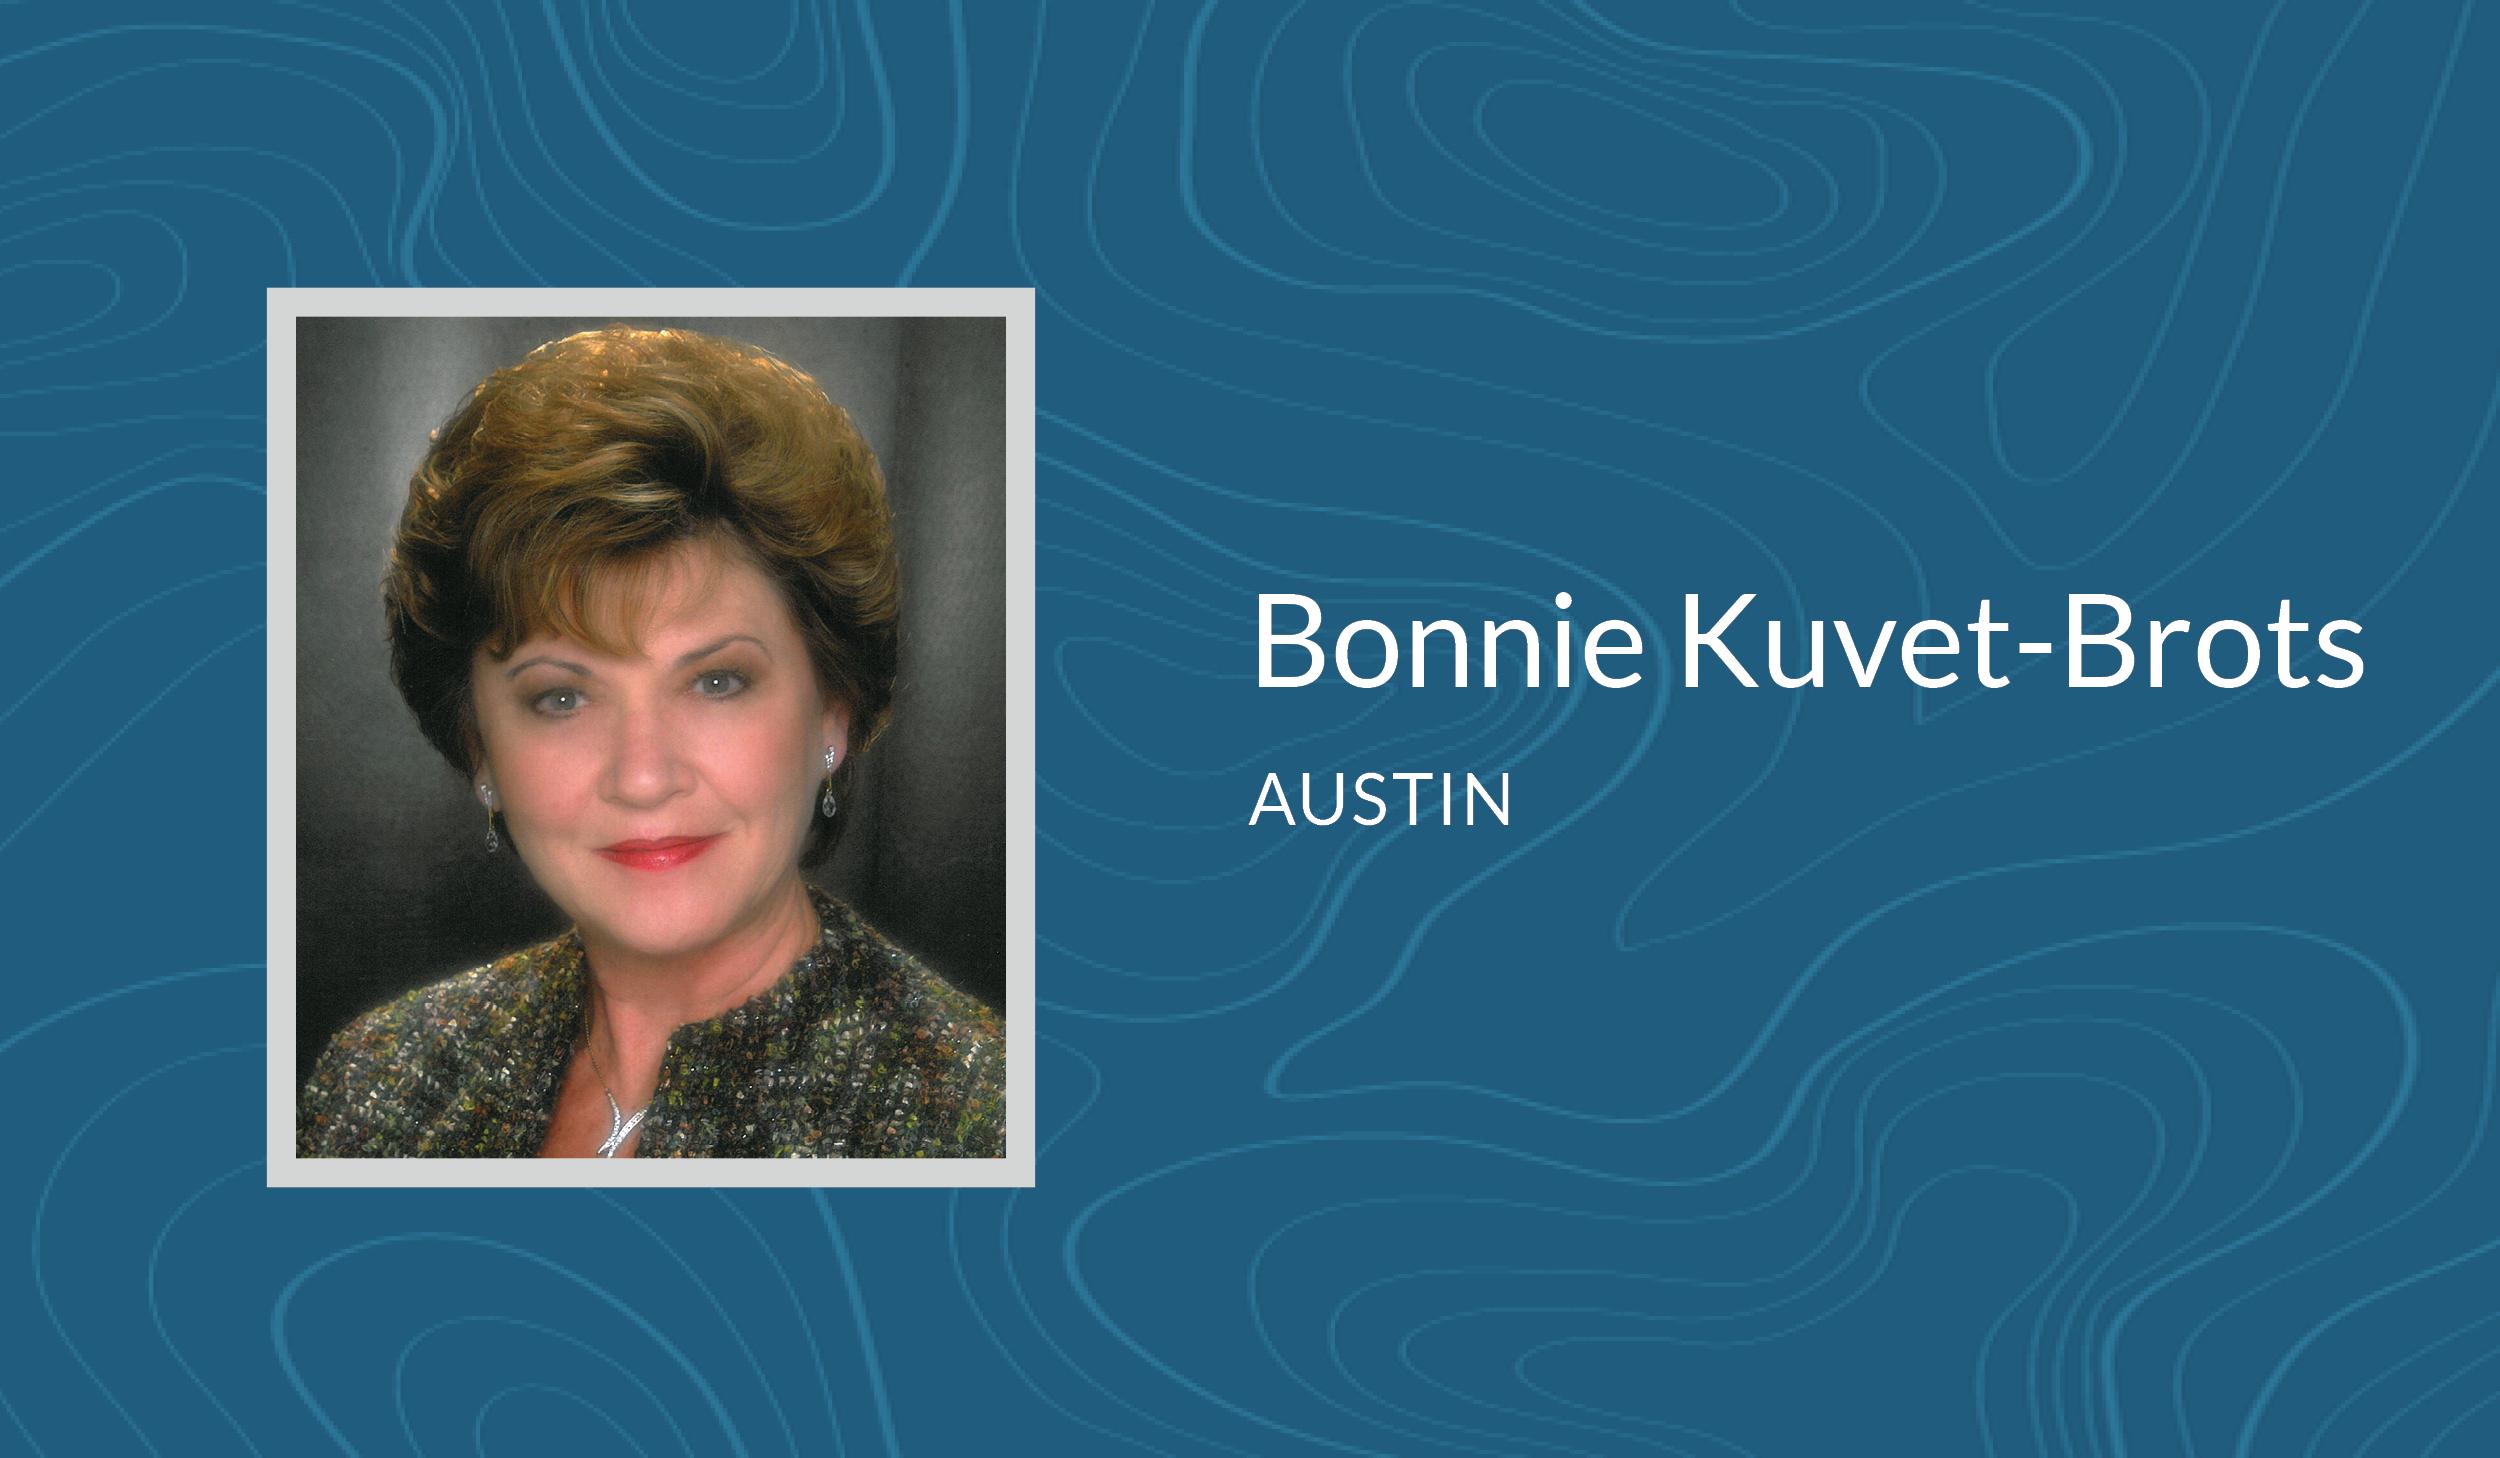 Bonnie Kuvet-Brots Landing Page Headers.png